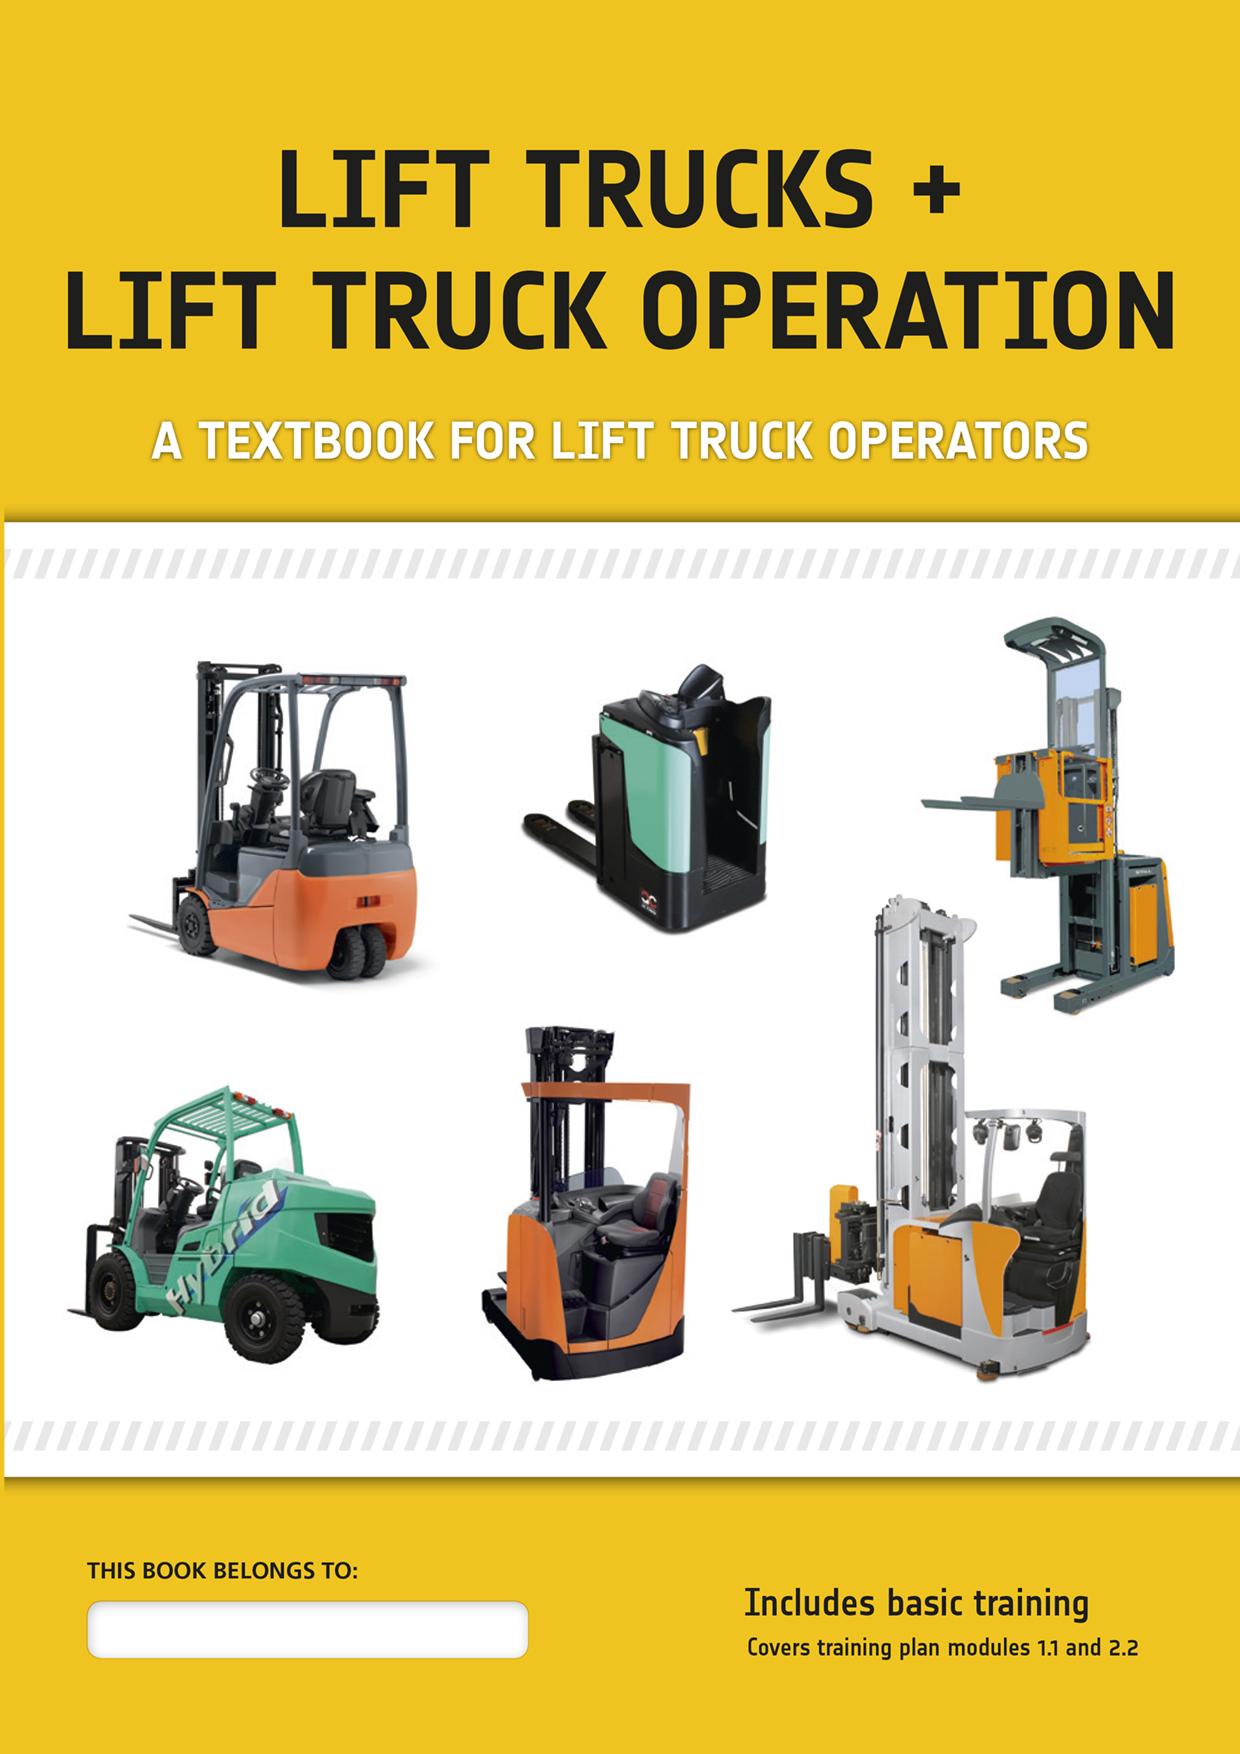 elevsett lift trucks lift truck operation. Black Bedroom Furniture Sets. Home Design Ideas